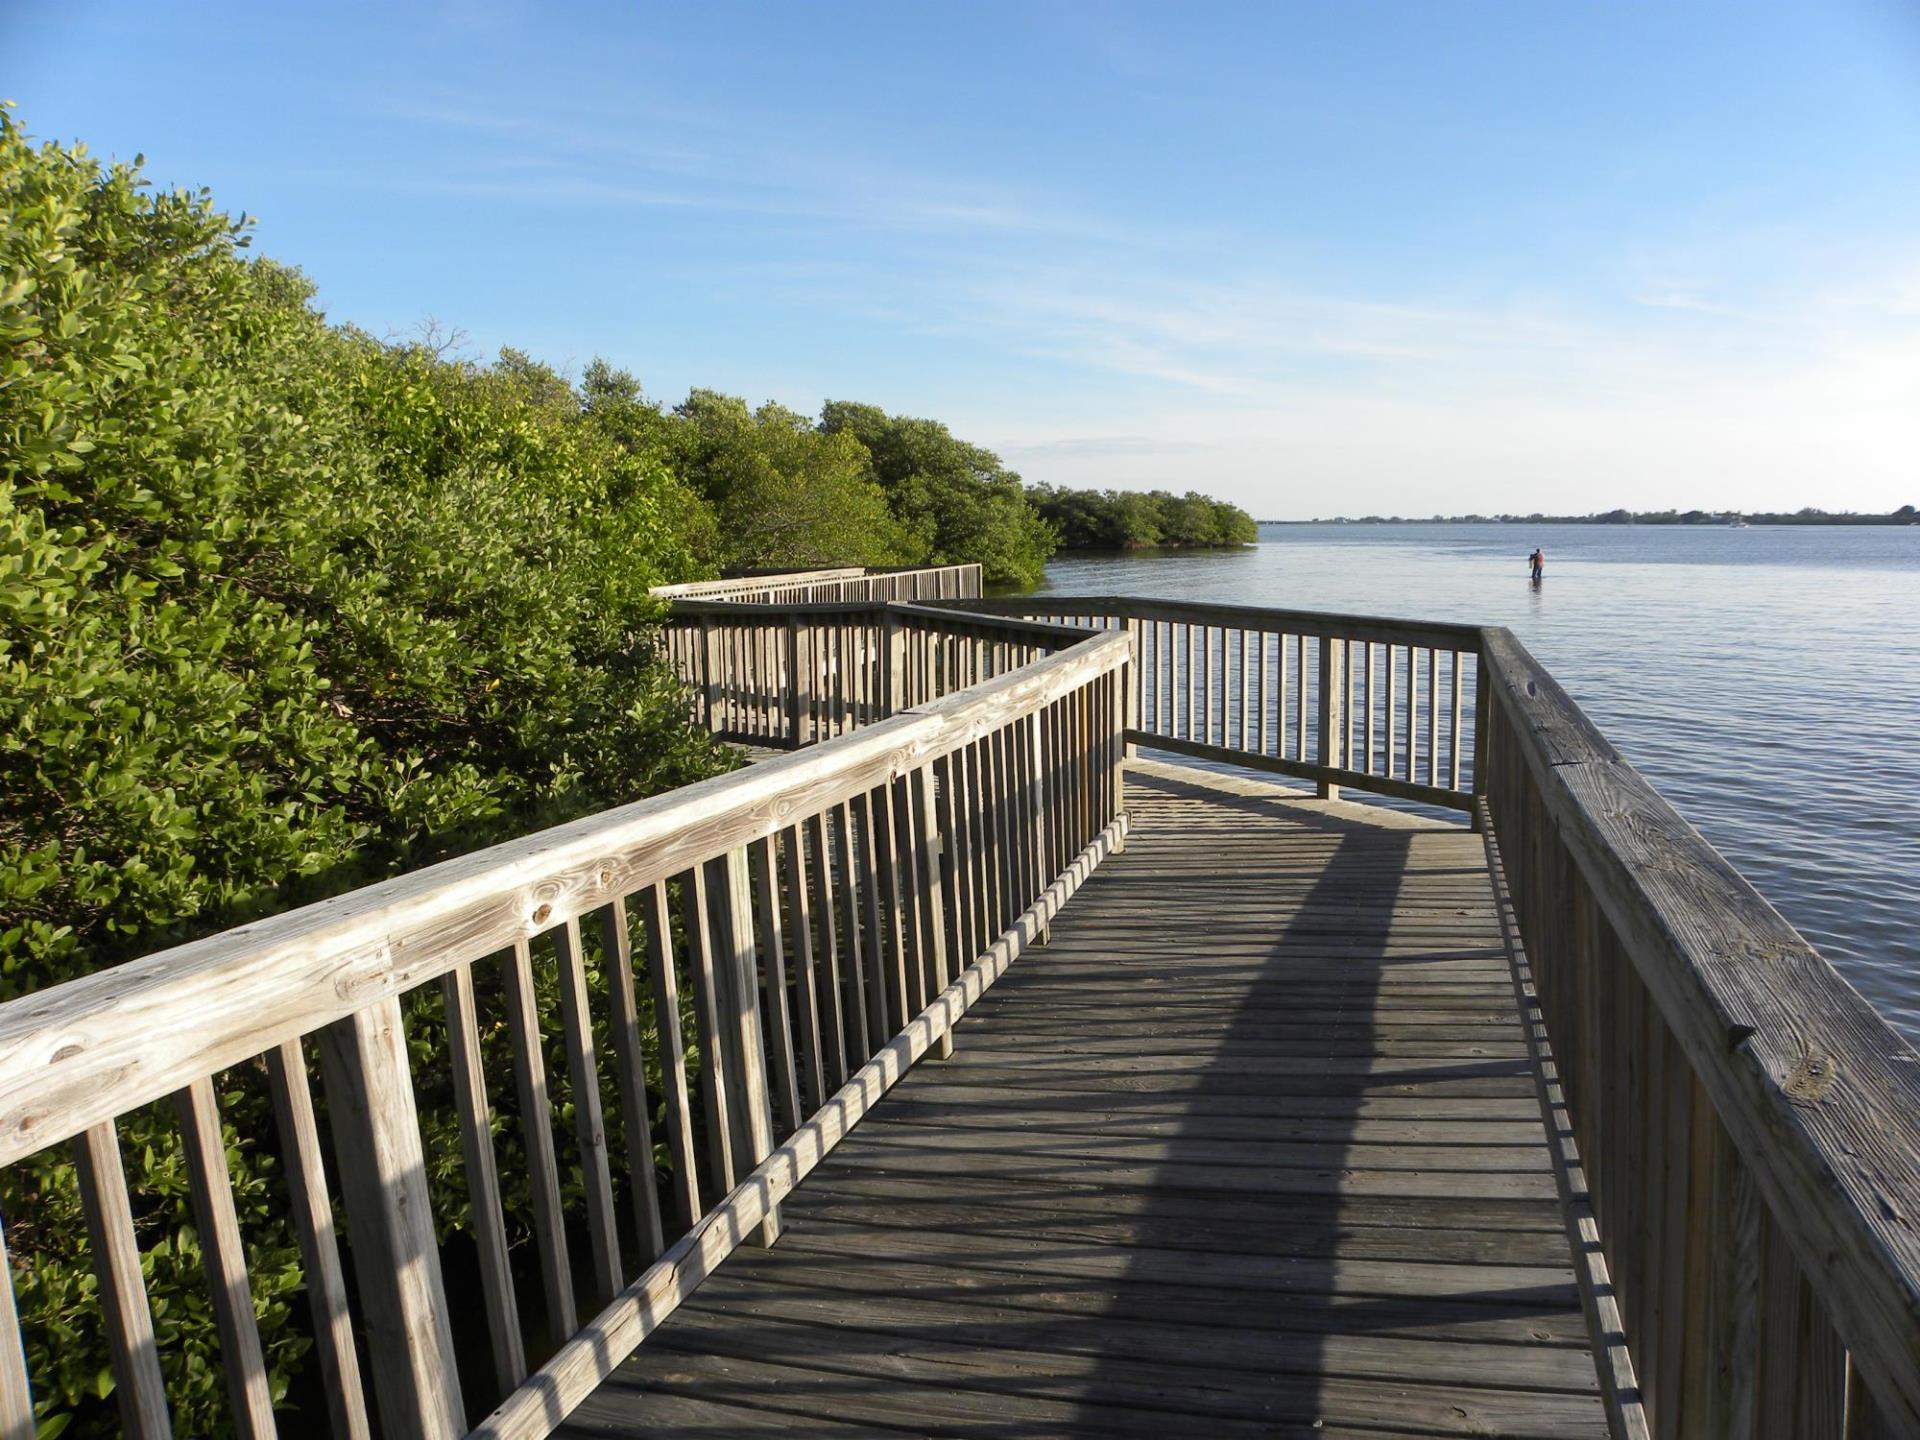 Lemon Bay Park and Environmental Center